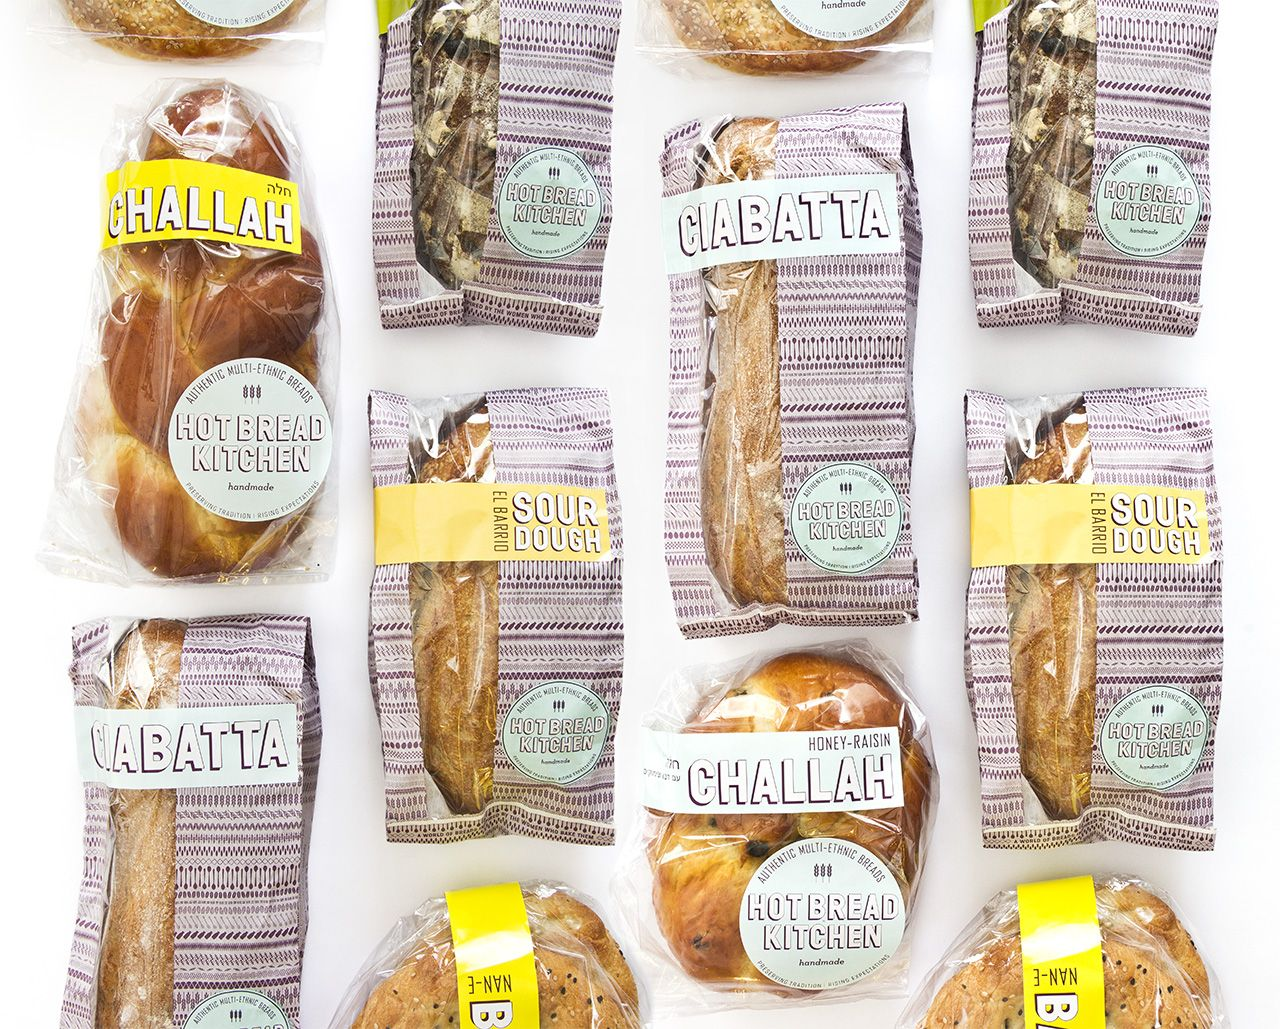 Hot Bread Kitchen - branding and packaging   Pentagram   packaging ...